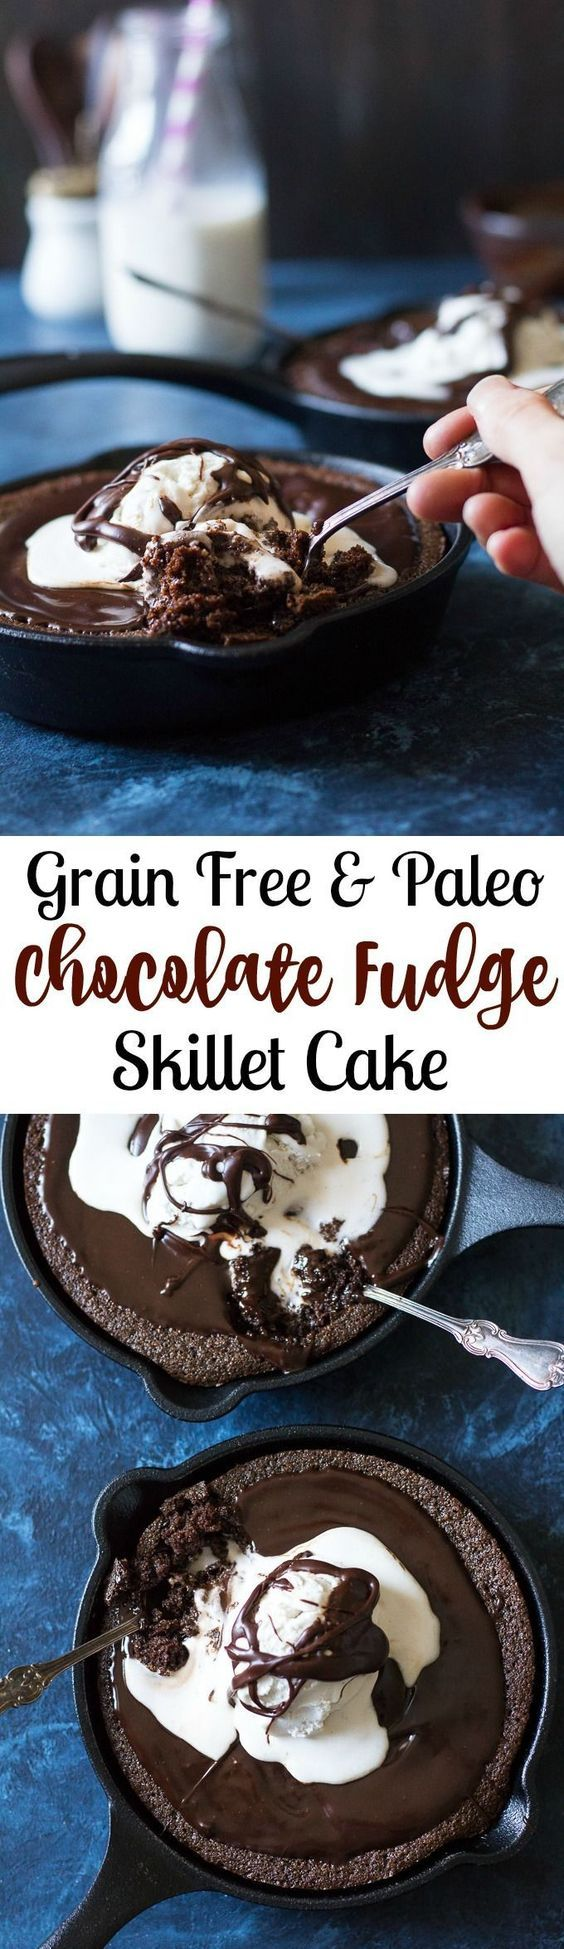 fudgy paleo chocolate skillet cake receta gluten free recipes pinterest. Black Bedroom Furniture Sets. Home Design Ideas